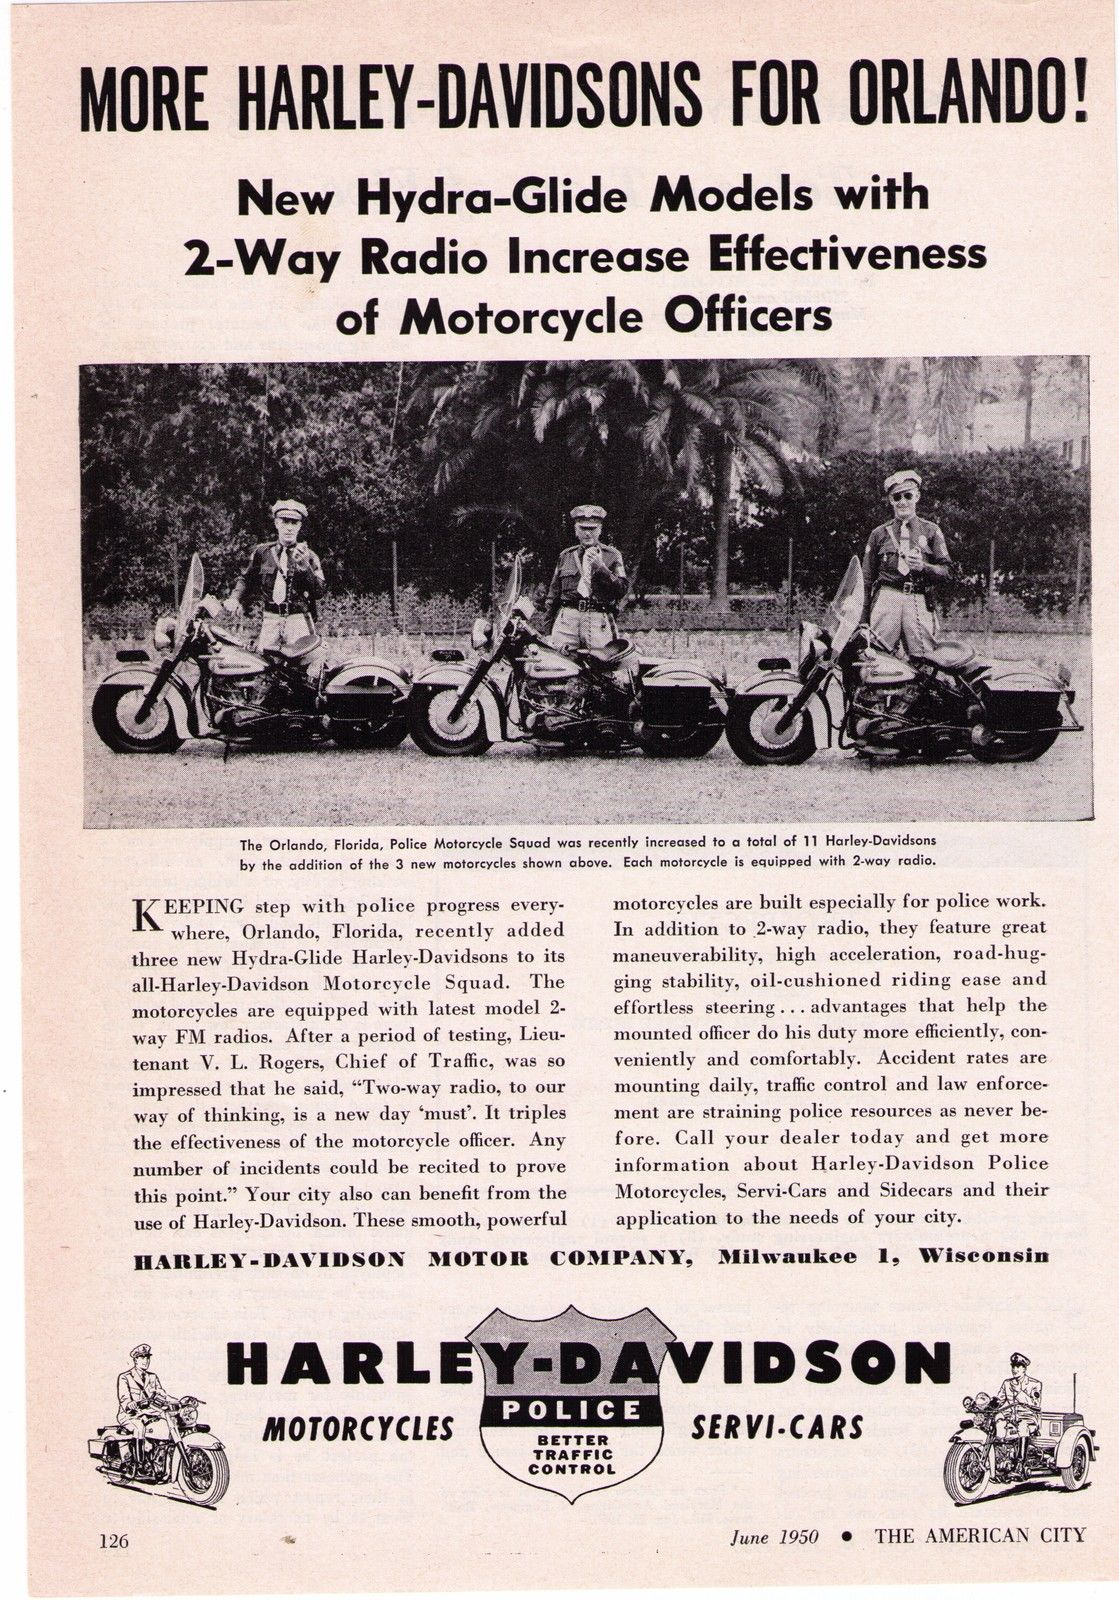 More Harley-Davidson for Orlando